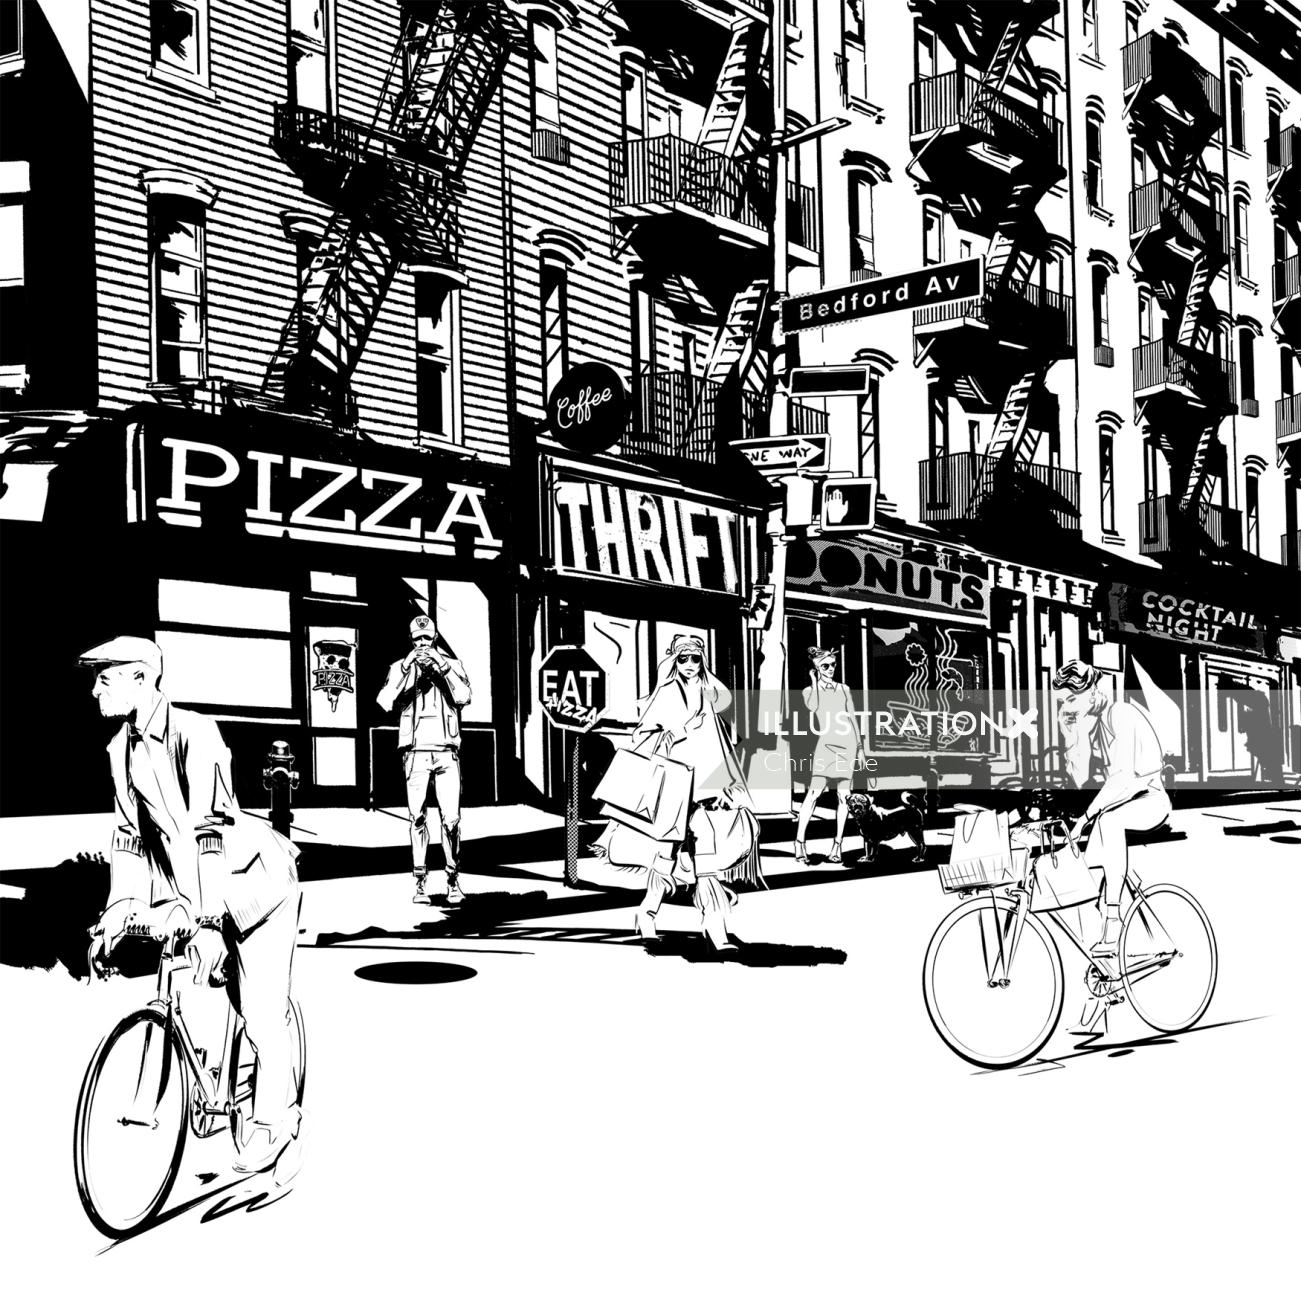 black and white illustration of Brooklyn city street scene